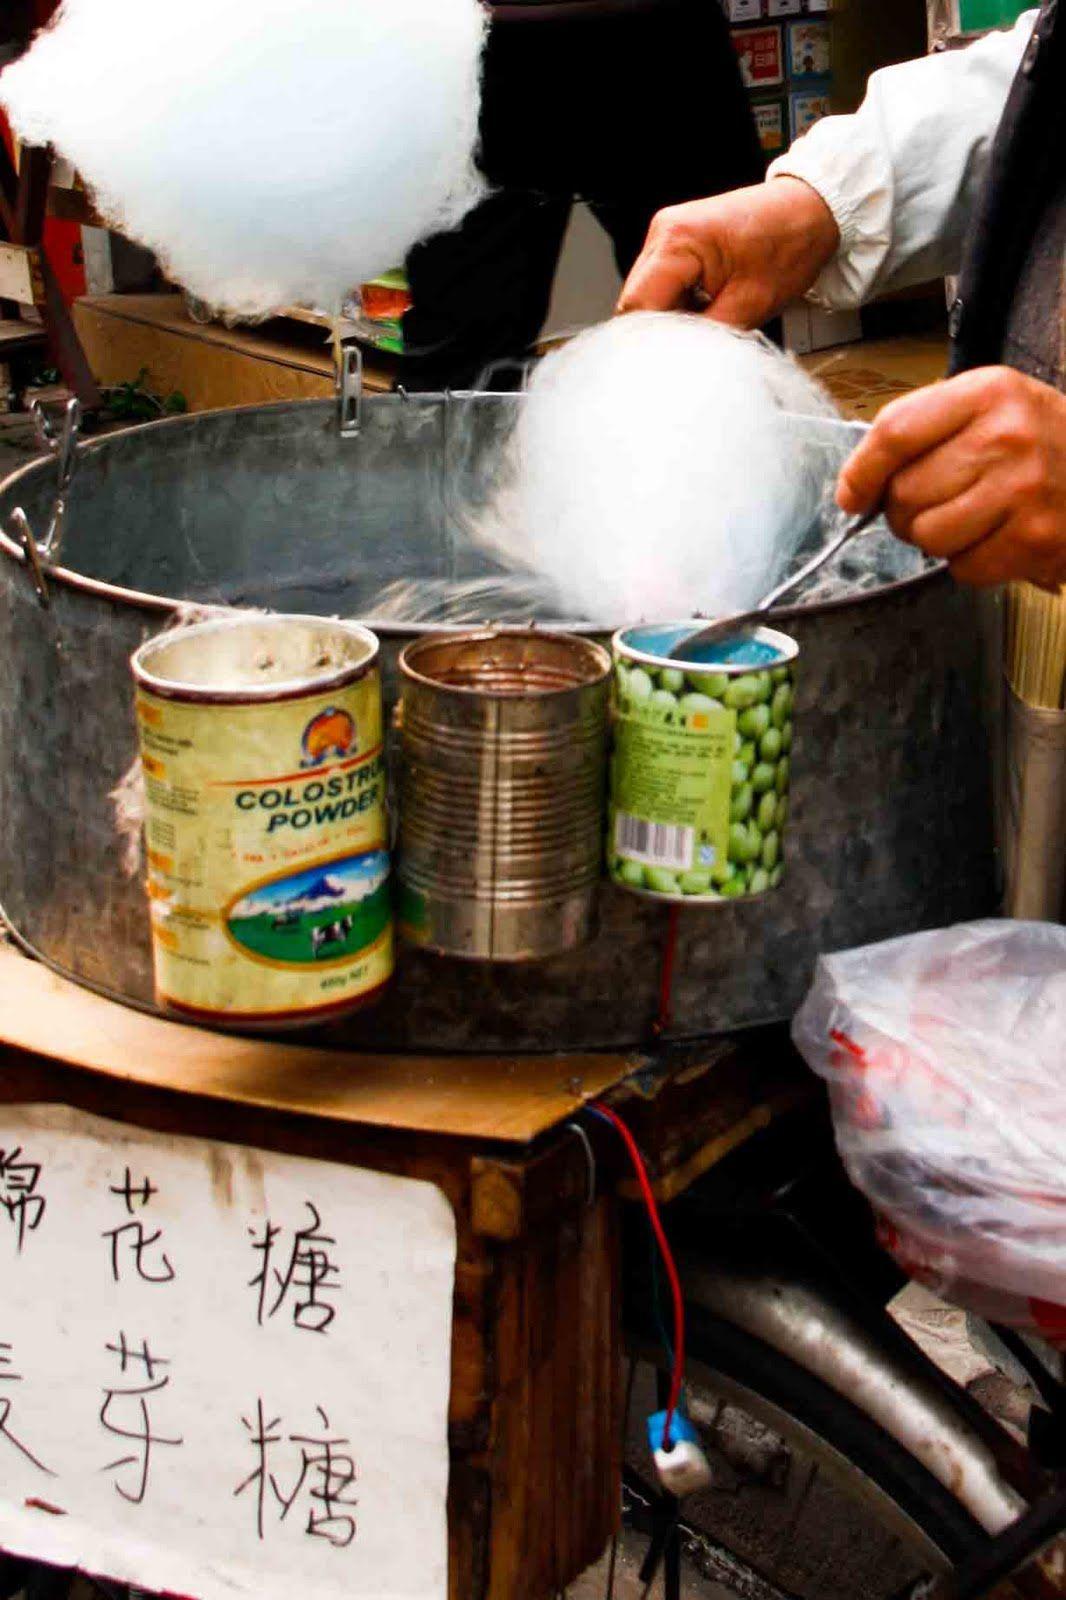 Shanghai Street Food #19 Cotton Candy: Miánhuā Táng 棉 花 糖